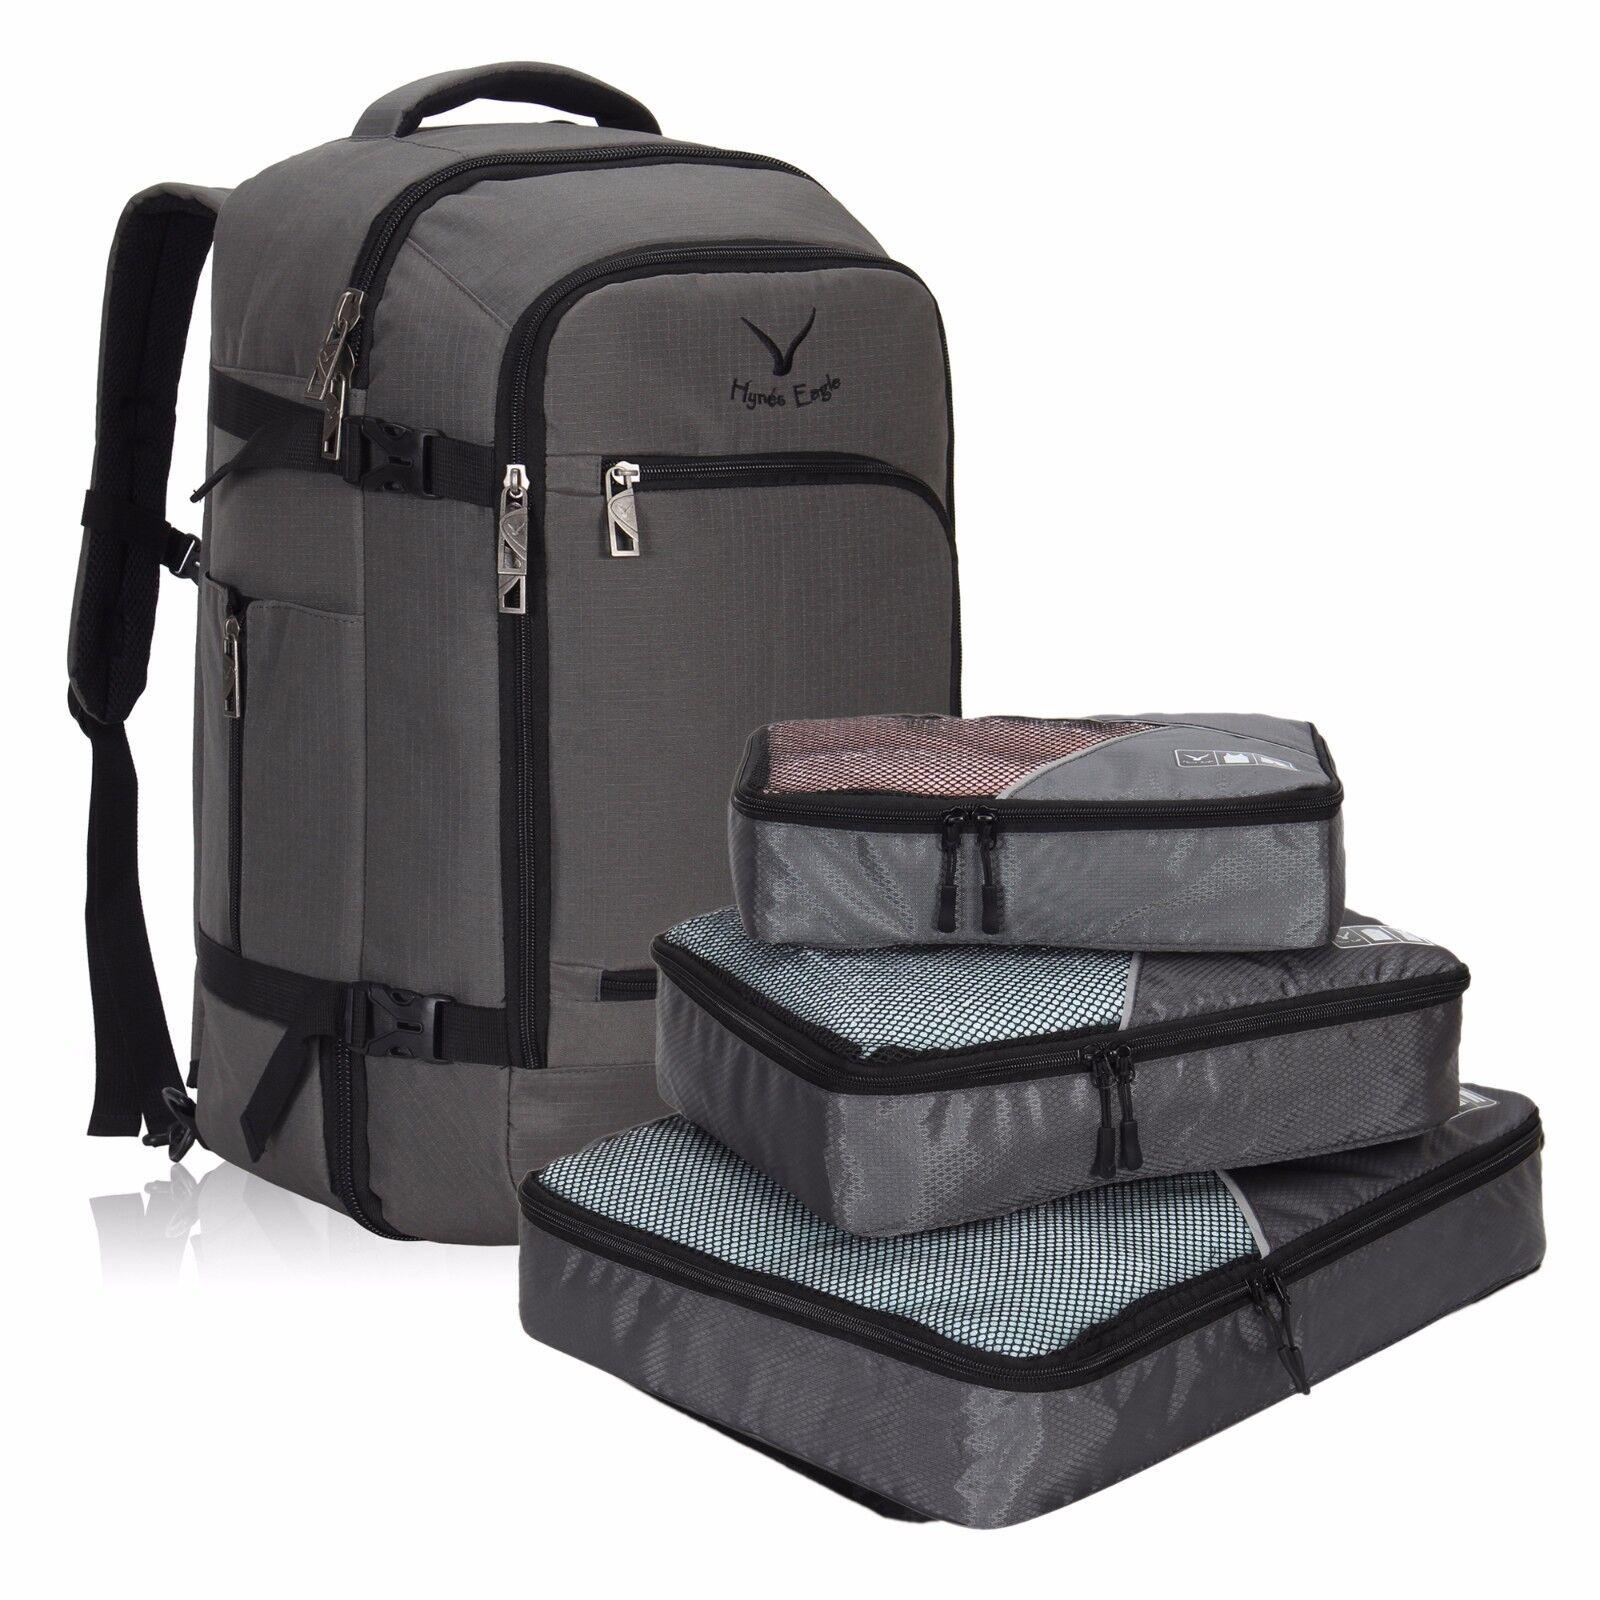 Hynes Eagle Travel Backpack 40L Flight Approved Carry-on Bag